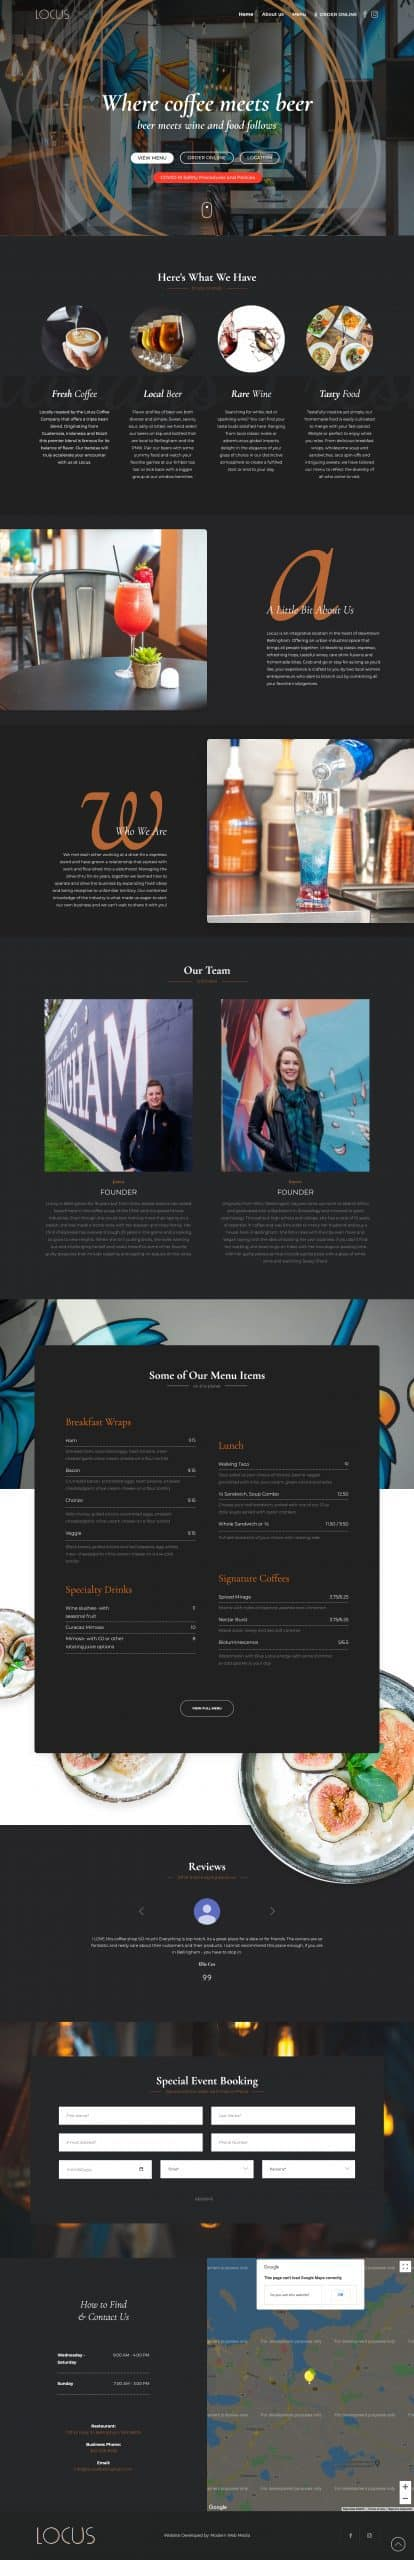 Locus Full Website Screenshot